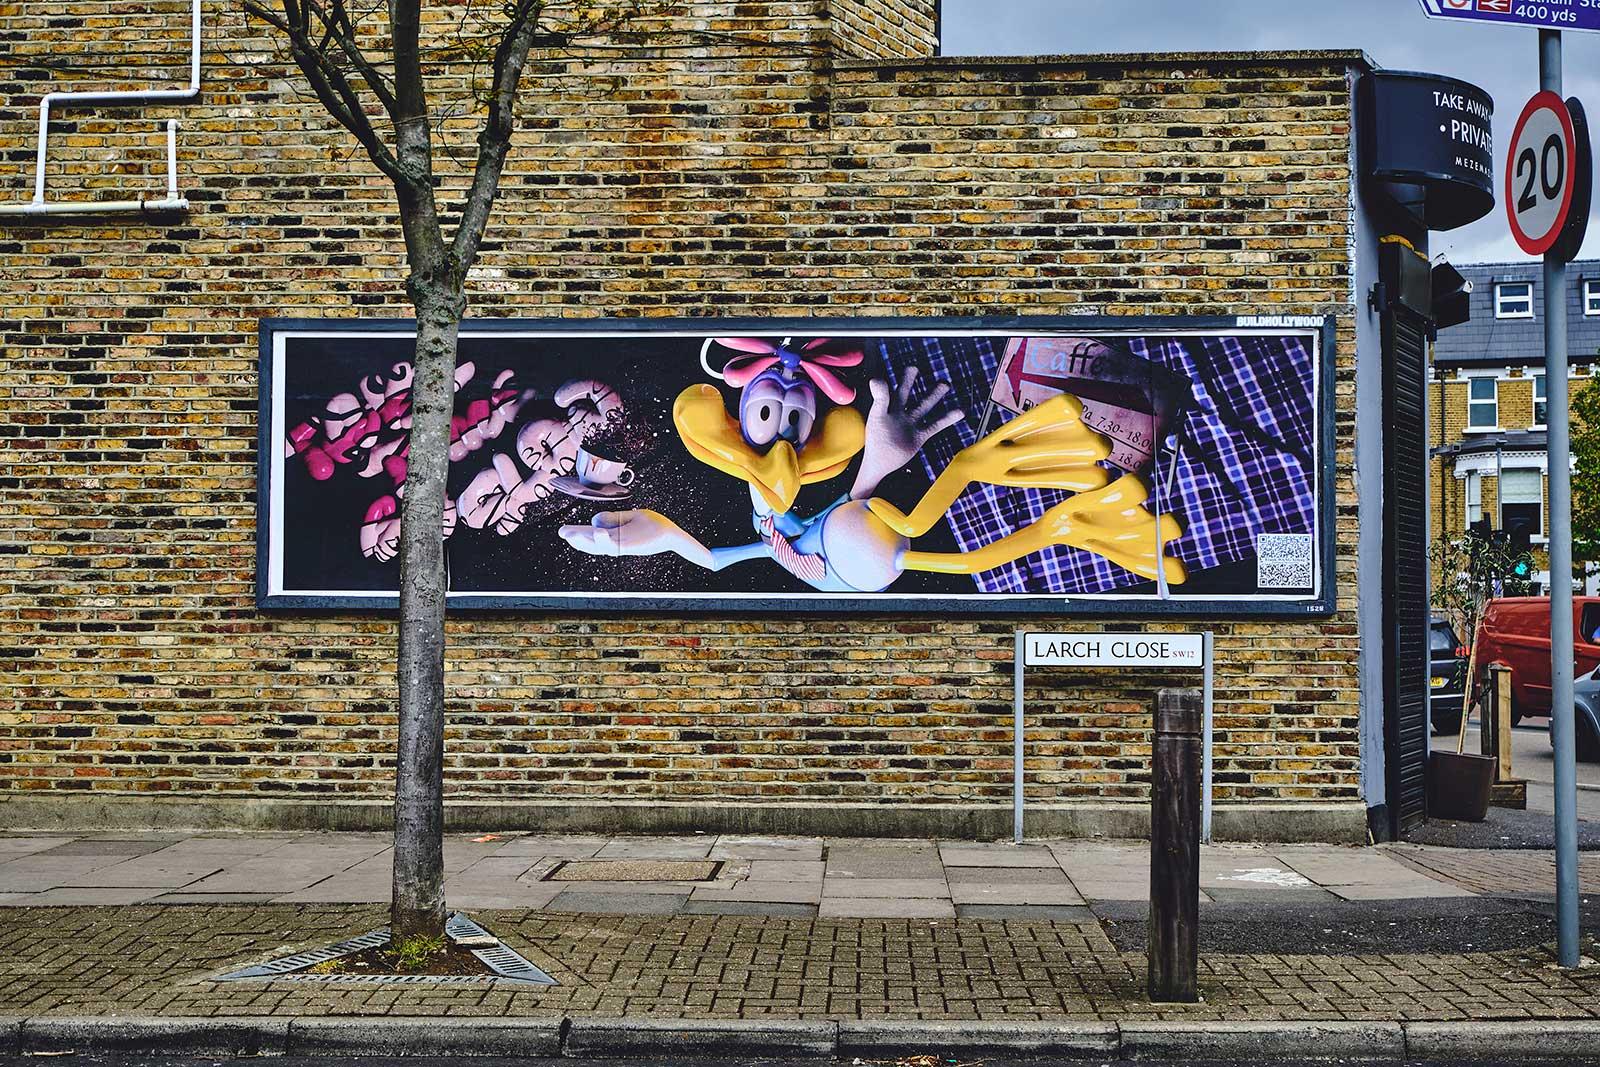 Fulfilment Services Ltd disseminate contemporary art across the capital